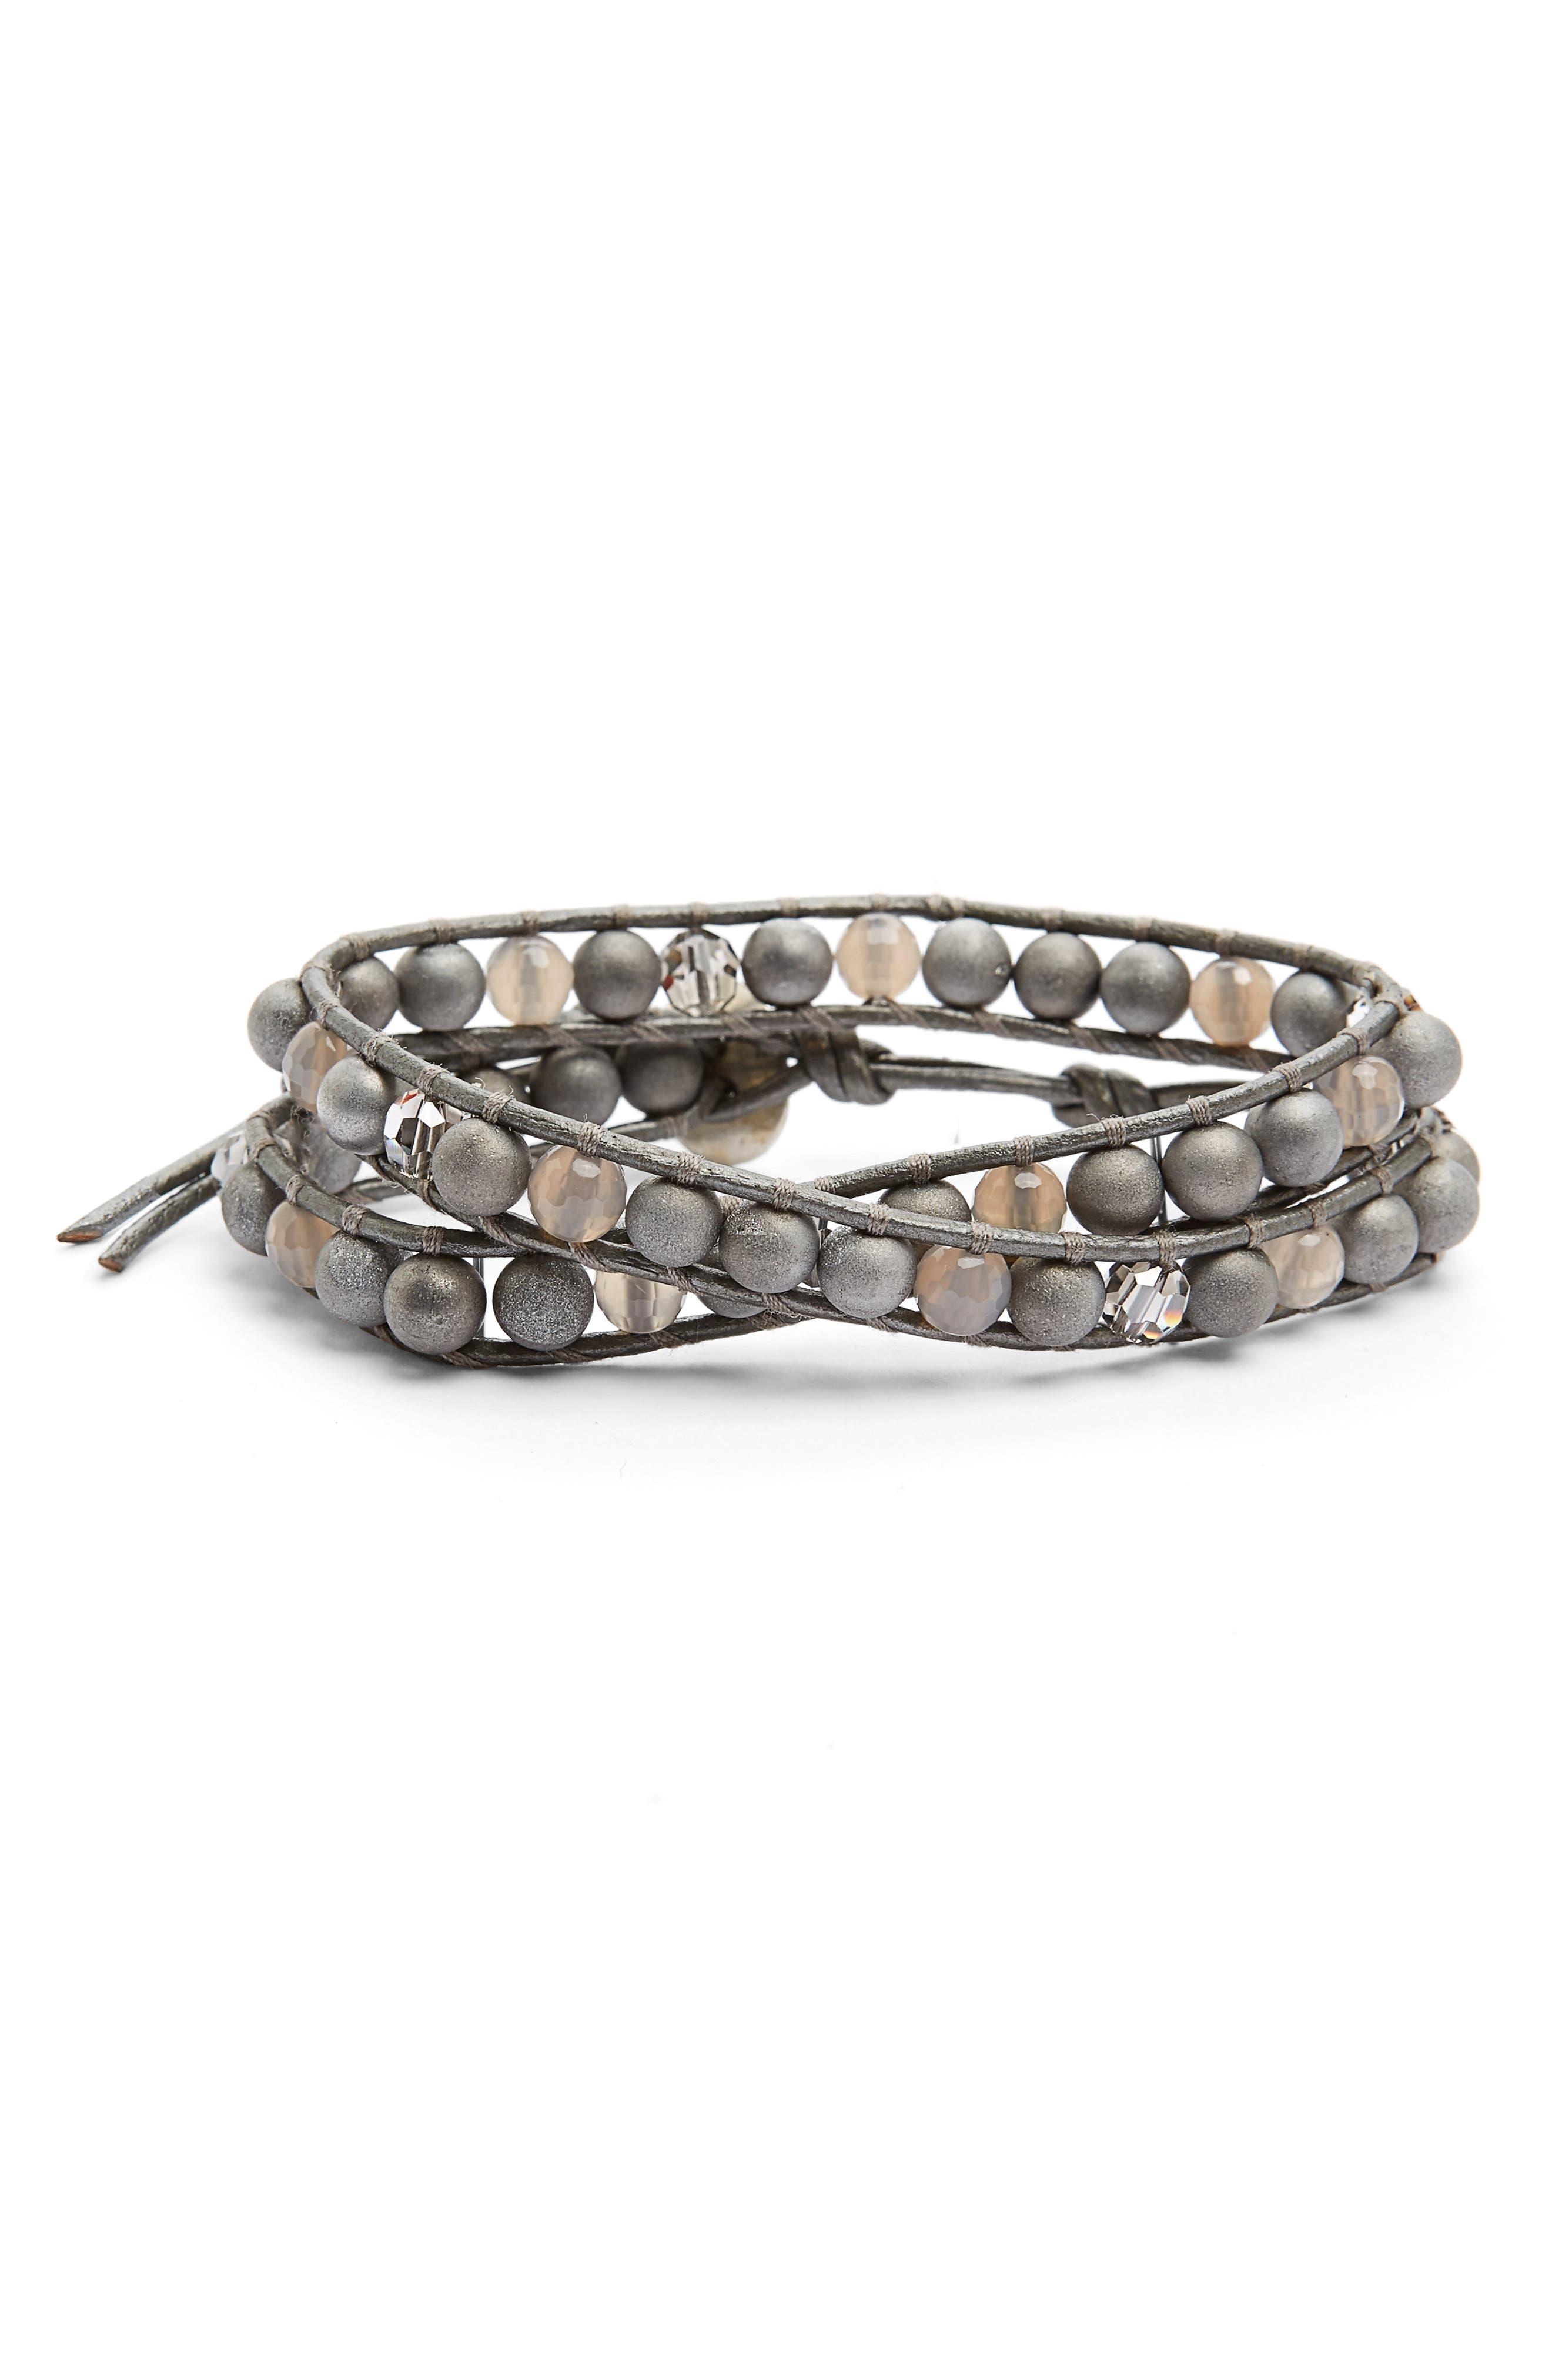 Alternate Image 1 Selected - Chan Luu Silver Agate & Crystal Wrap Bracelet